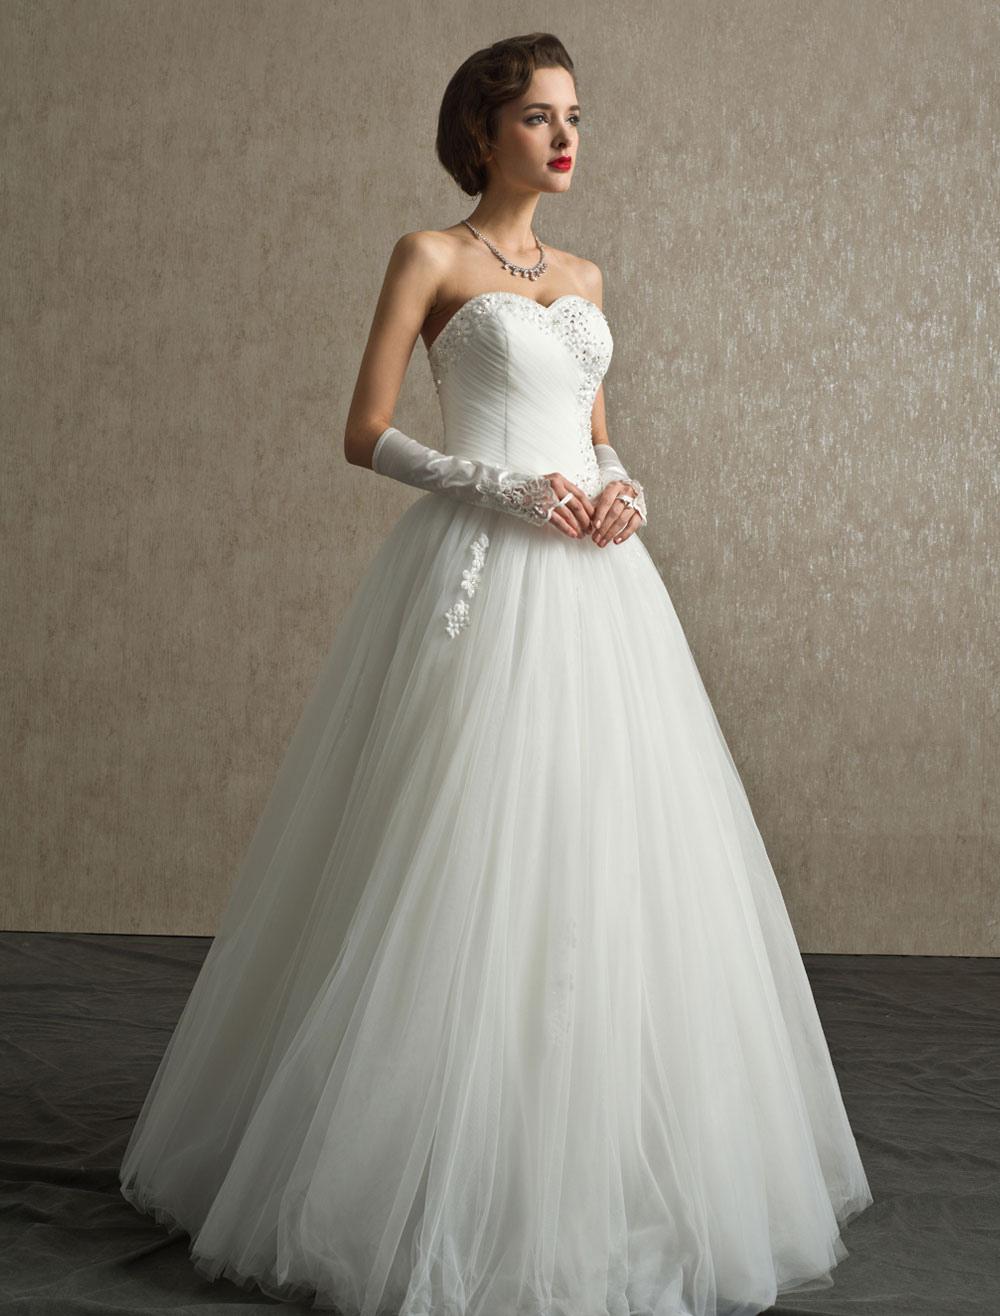 Rhinestone A-line Floor-Length Ivory Wedding Dress with Sweetheart Strapless Neck